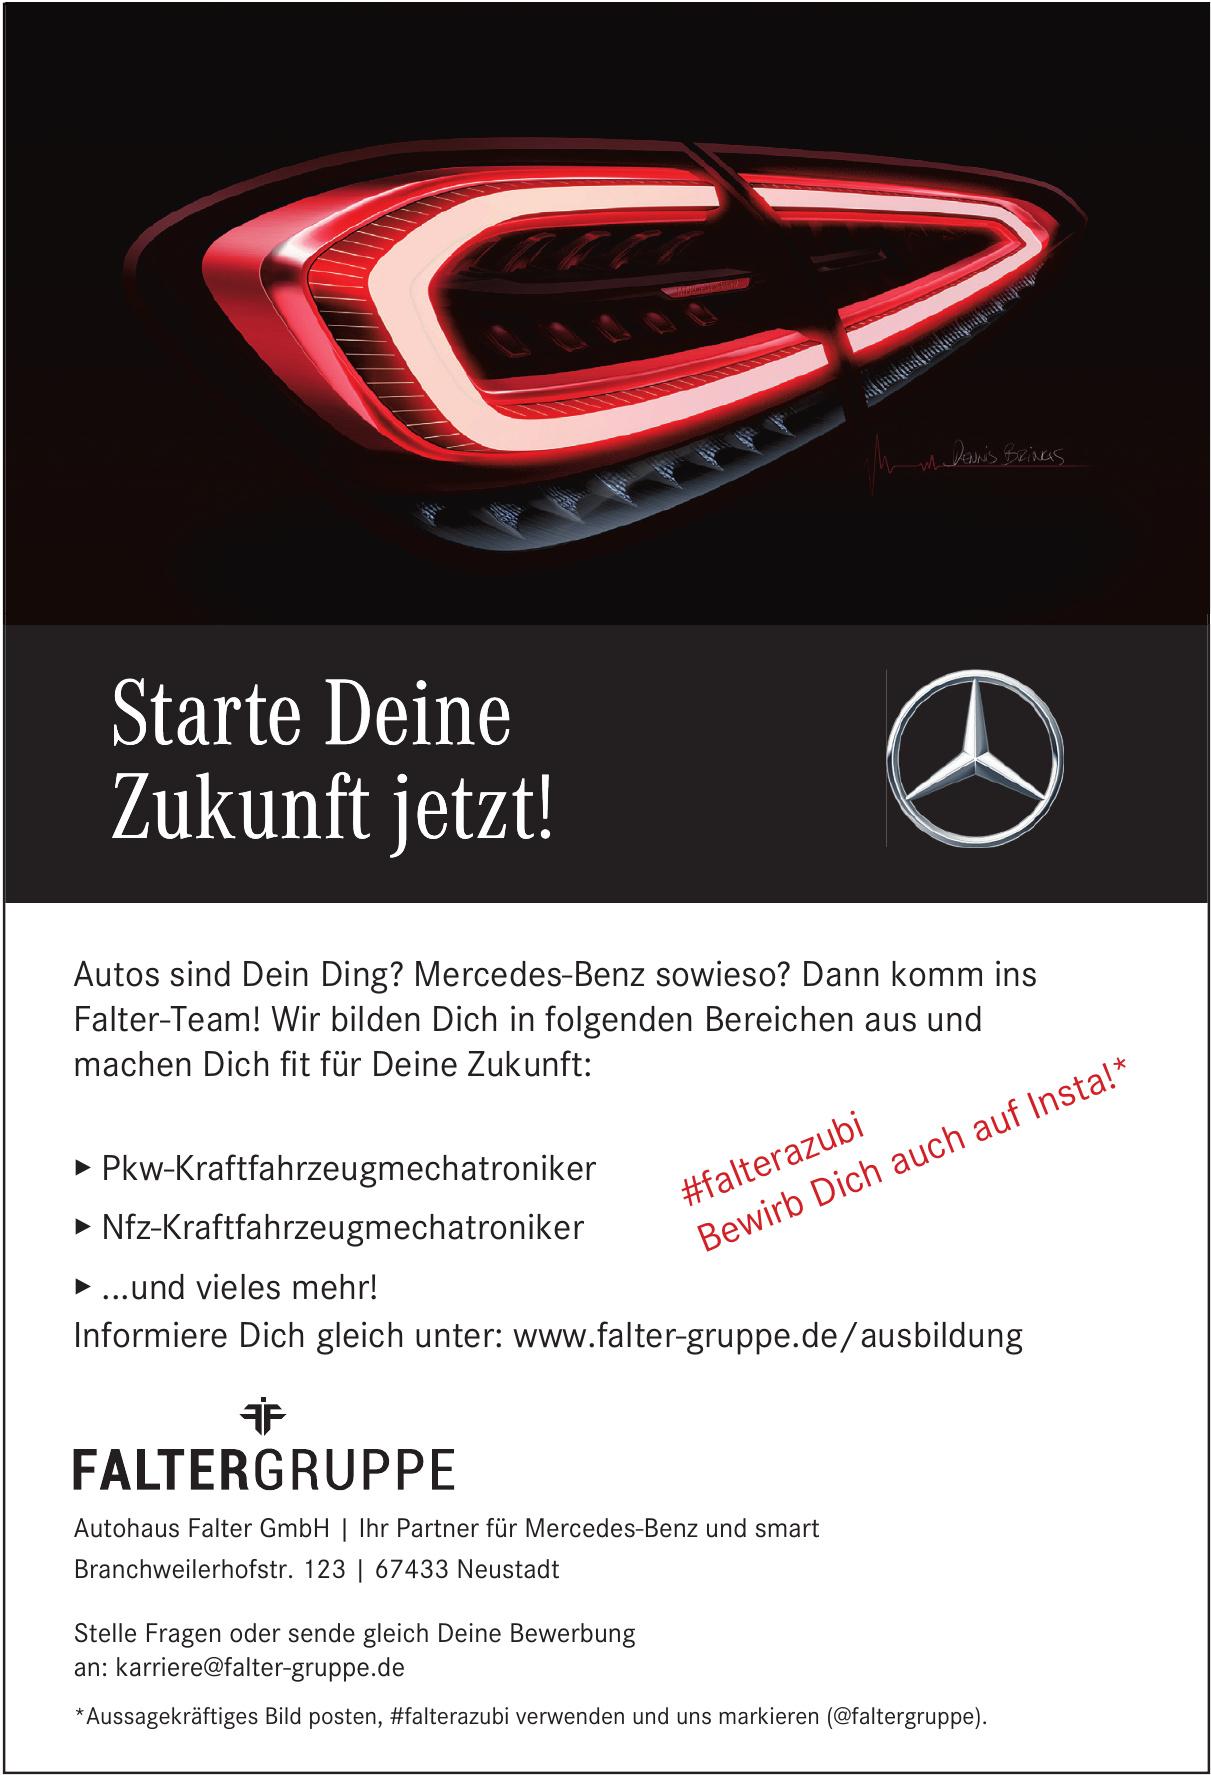 Autohaus Falter GmbH